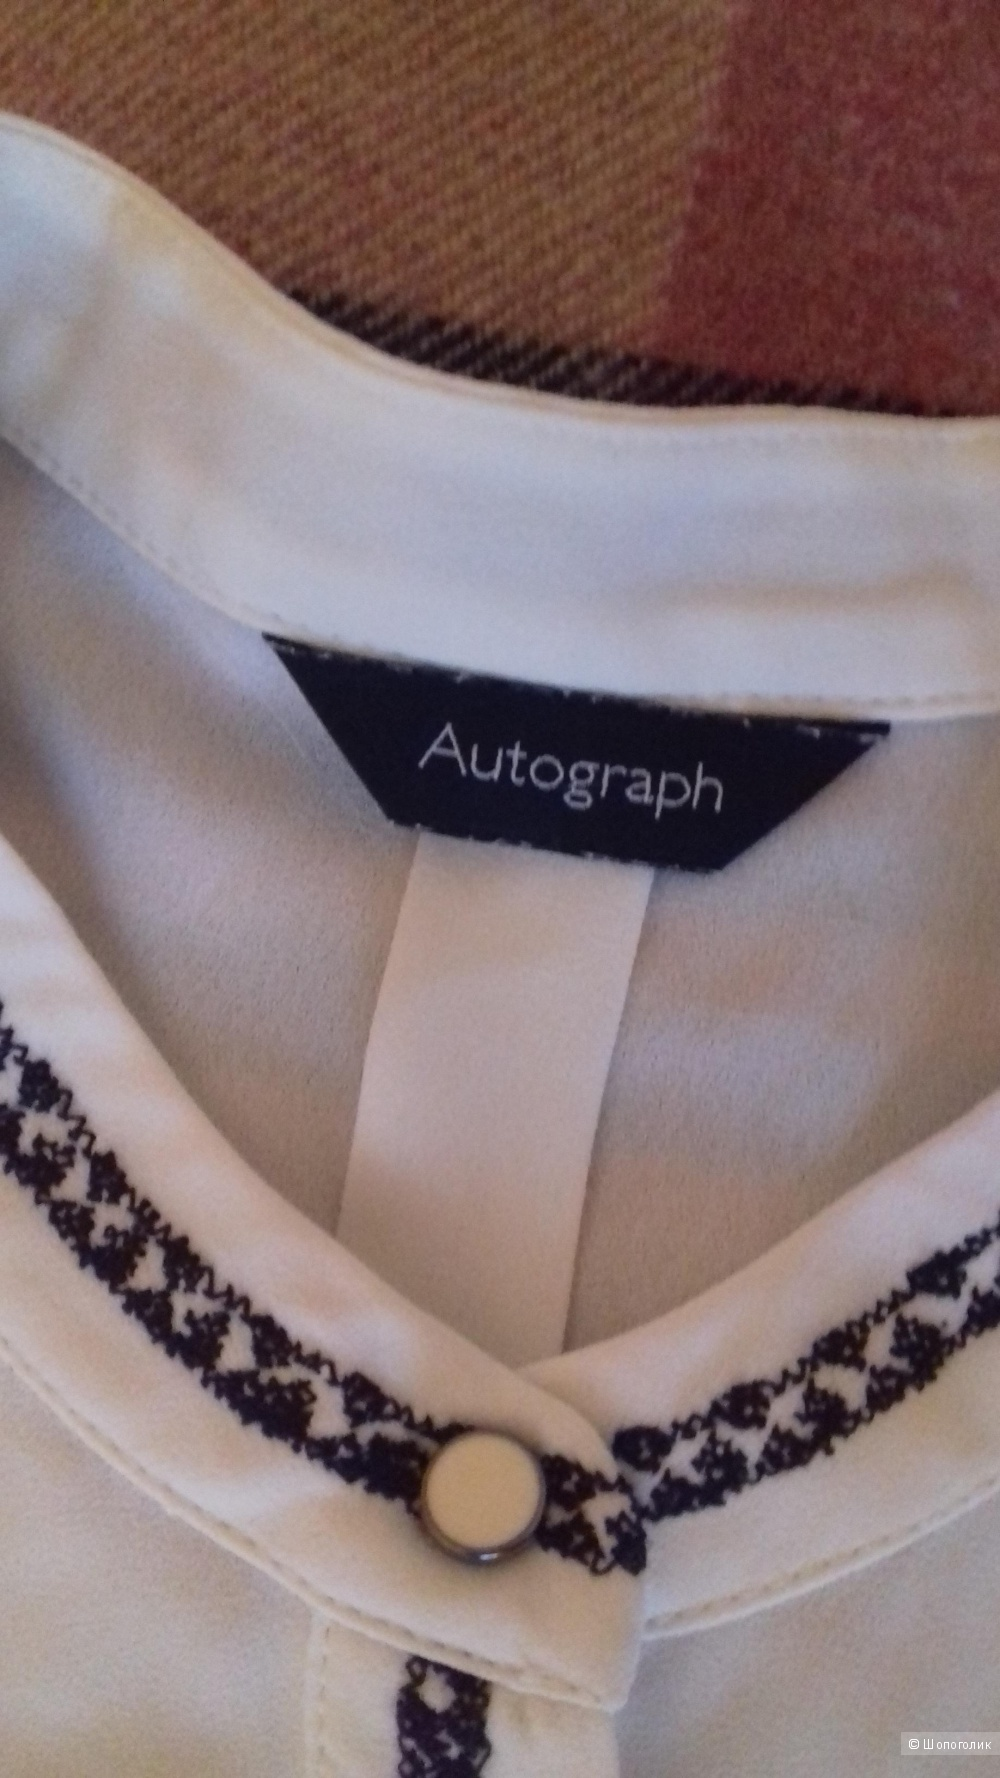 Рубашка Autograph. Размер U 10 (русский 48-50).